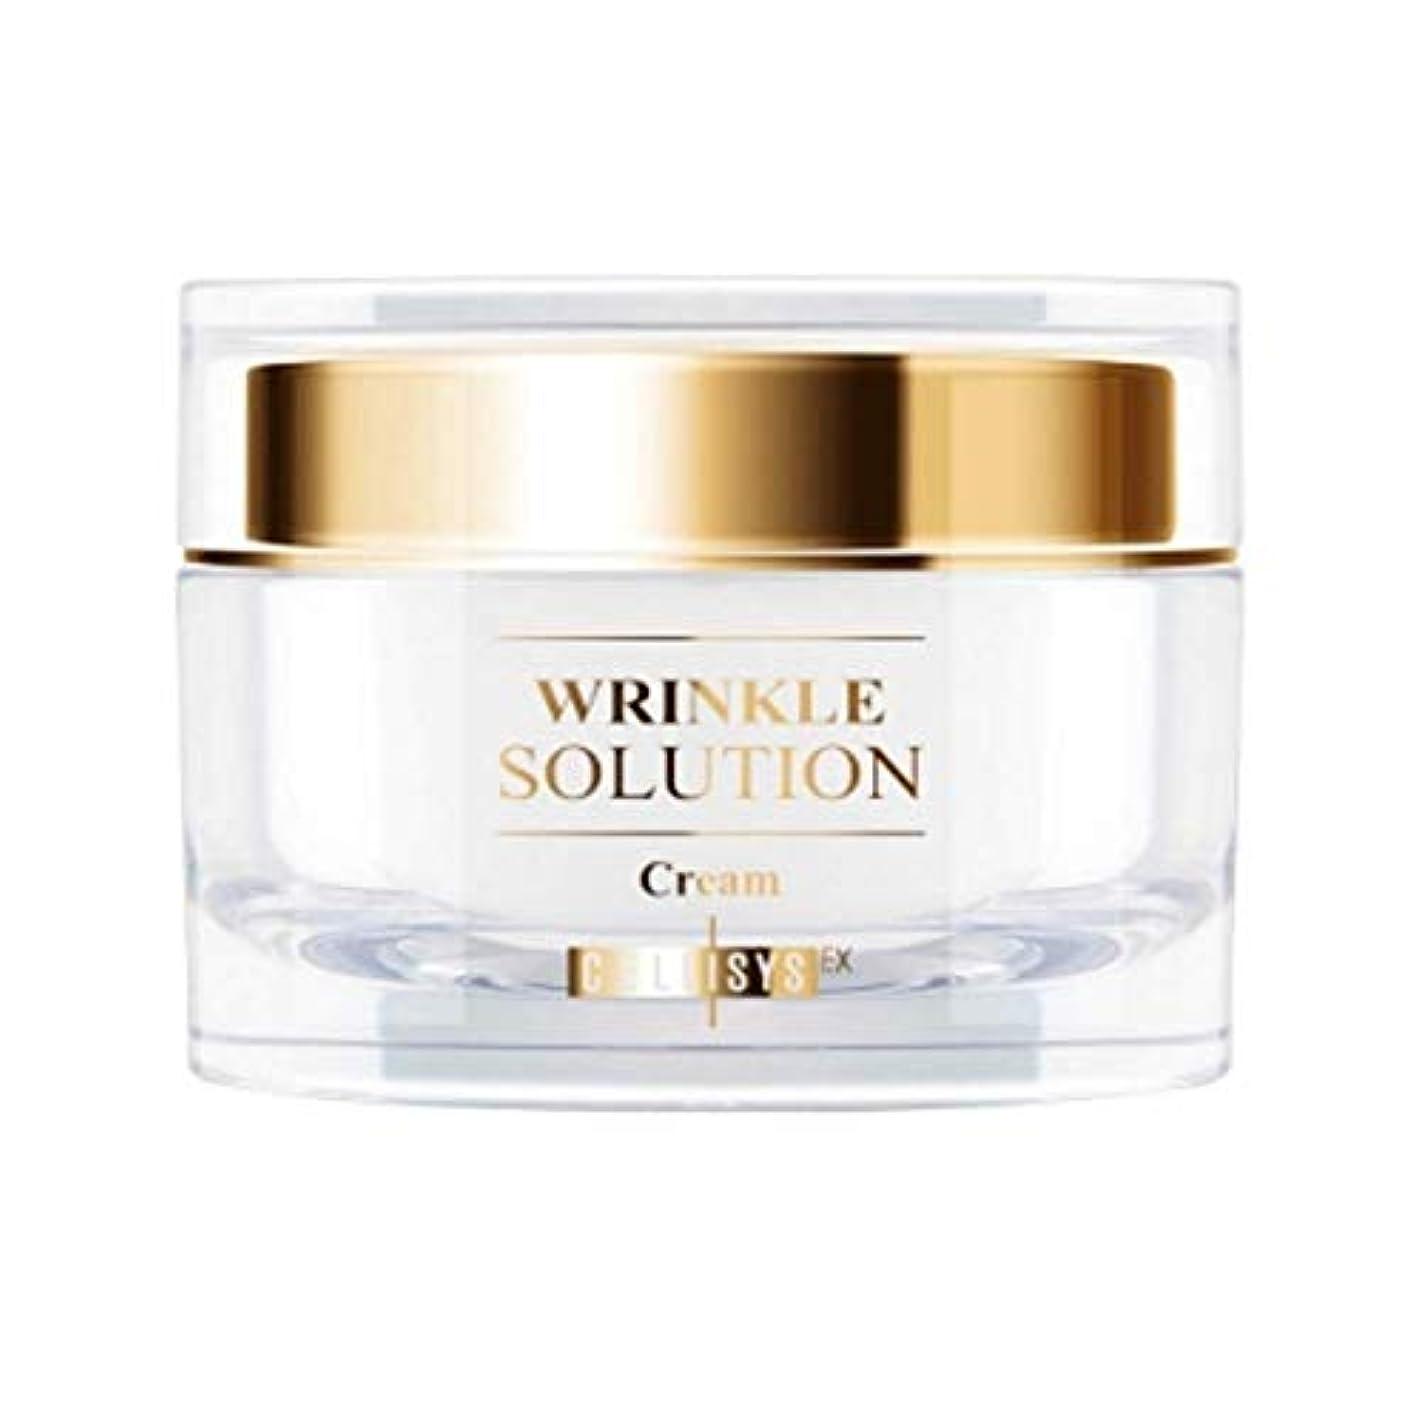 CELLISYS セリシス EX EGF リンクル ソリューション クリーム Winkle Solution Cream 50ml 【 高保湿 クリーム 韓国コスメ 】